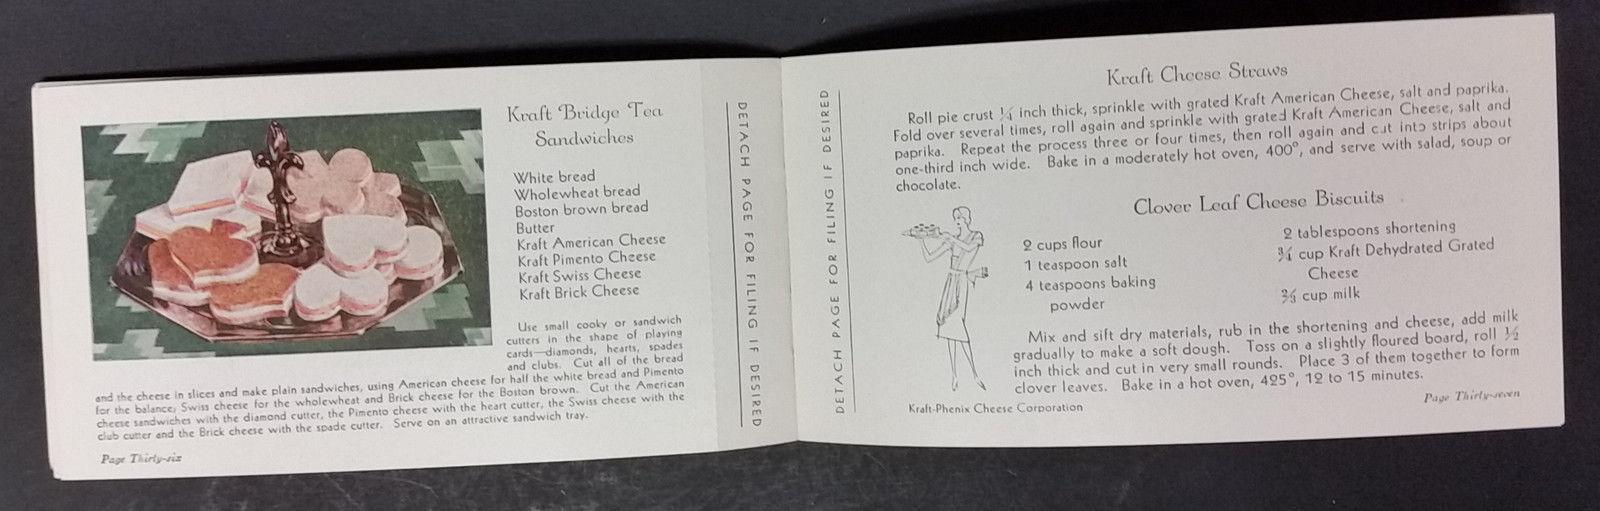 Kraft Phenix Cheese And Ways To Serve It 1933 Food Cookbook Ad Litho Dairy Menus